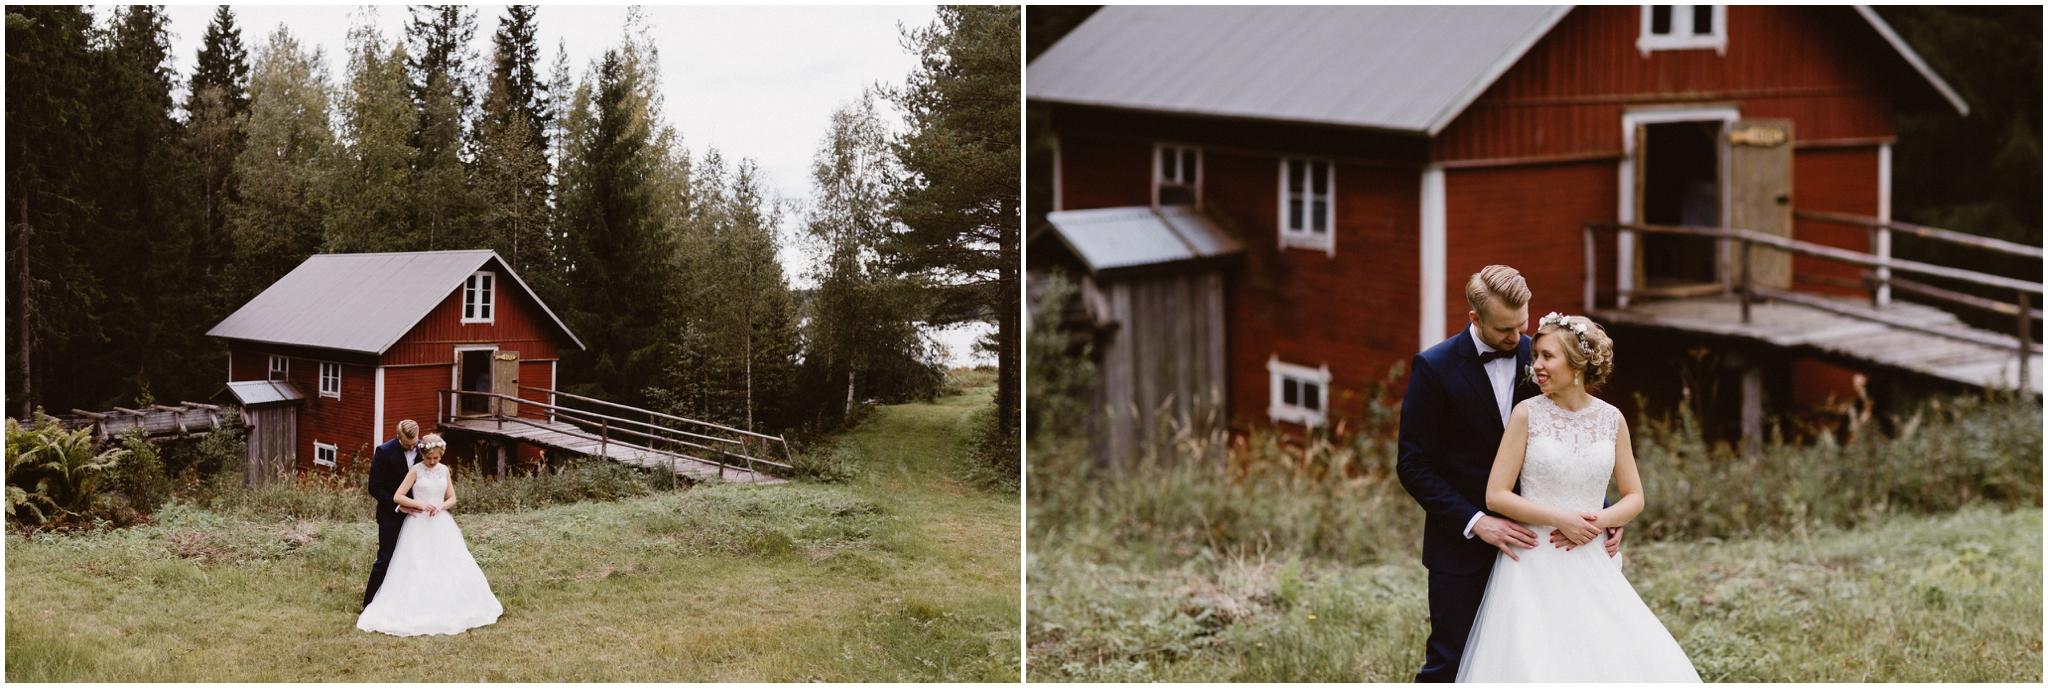 Leevi + Susanna -- Patrick Karkkolainen Wedding Photographer + Adventurer-109.jpg